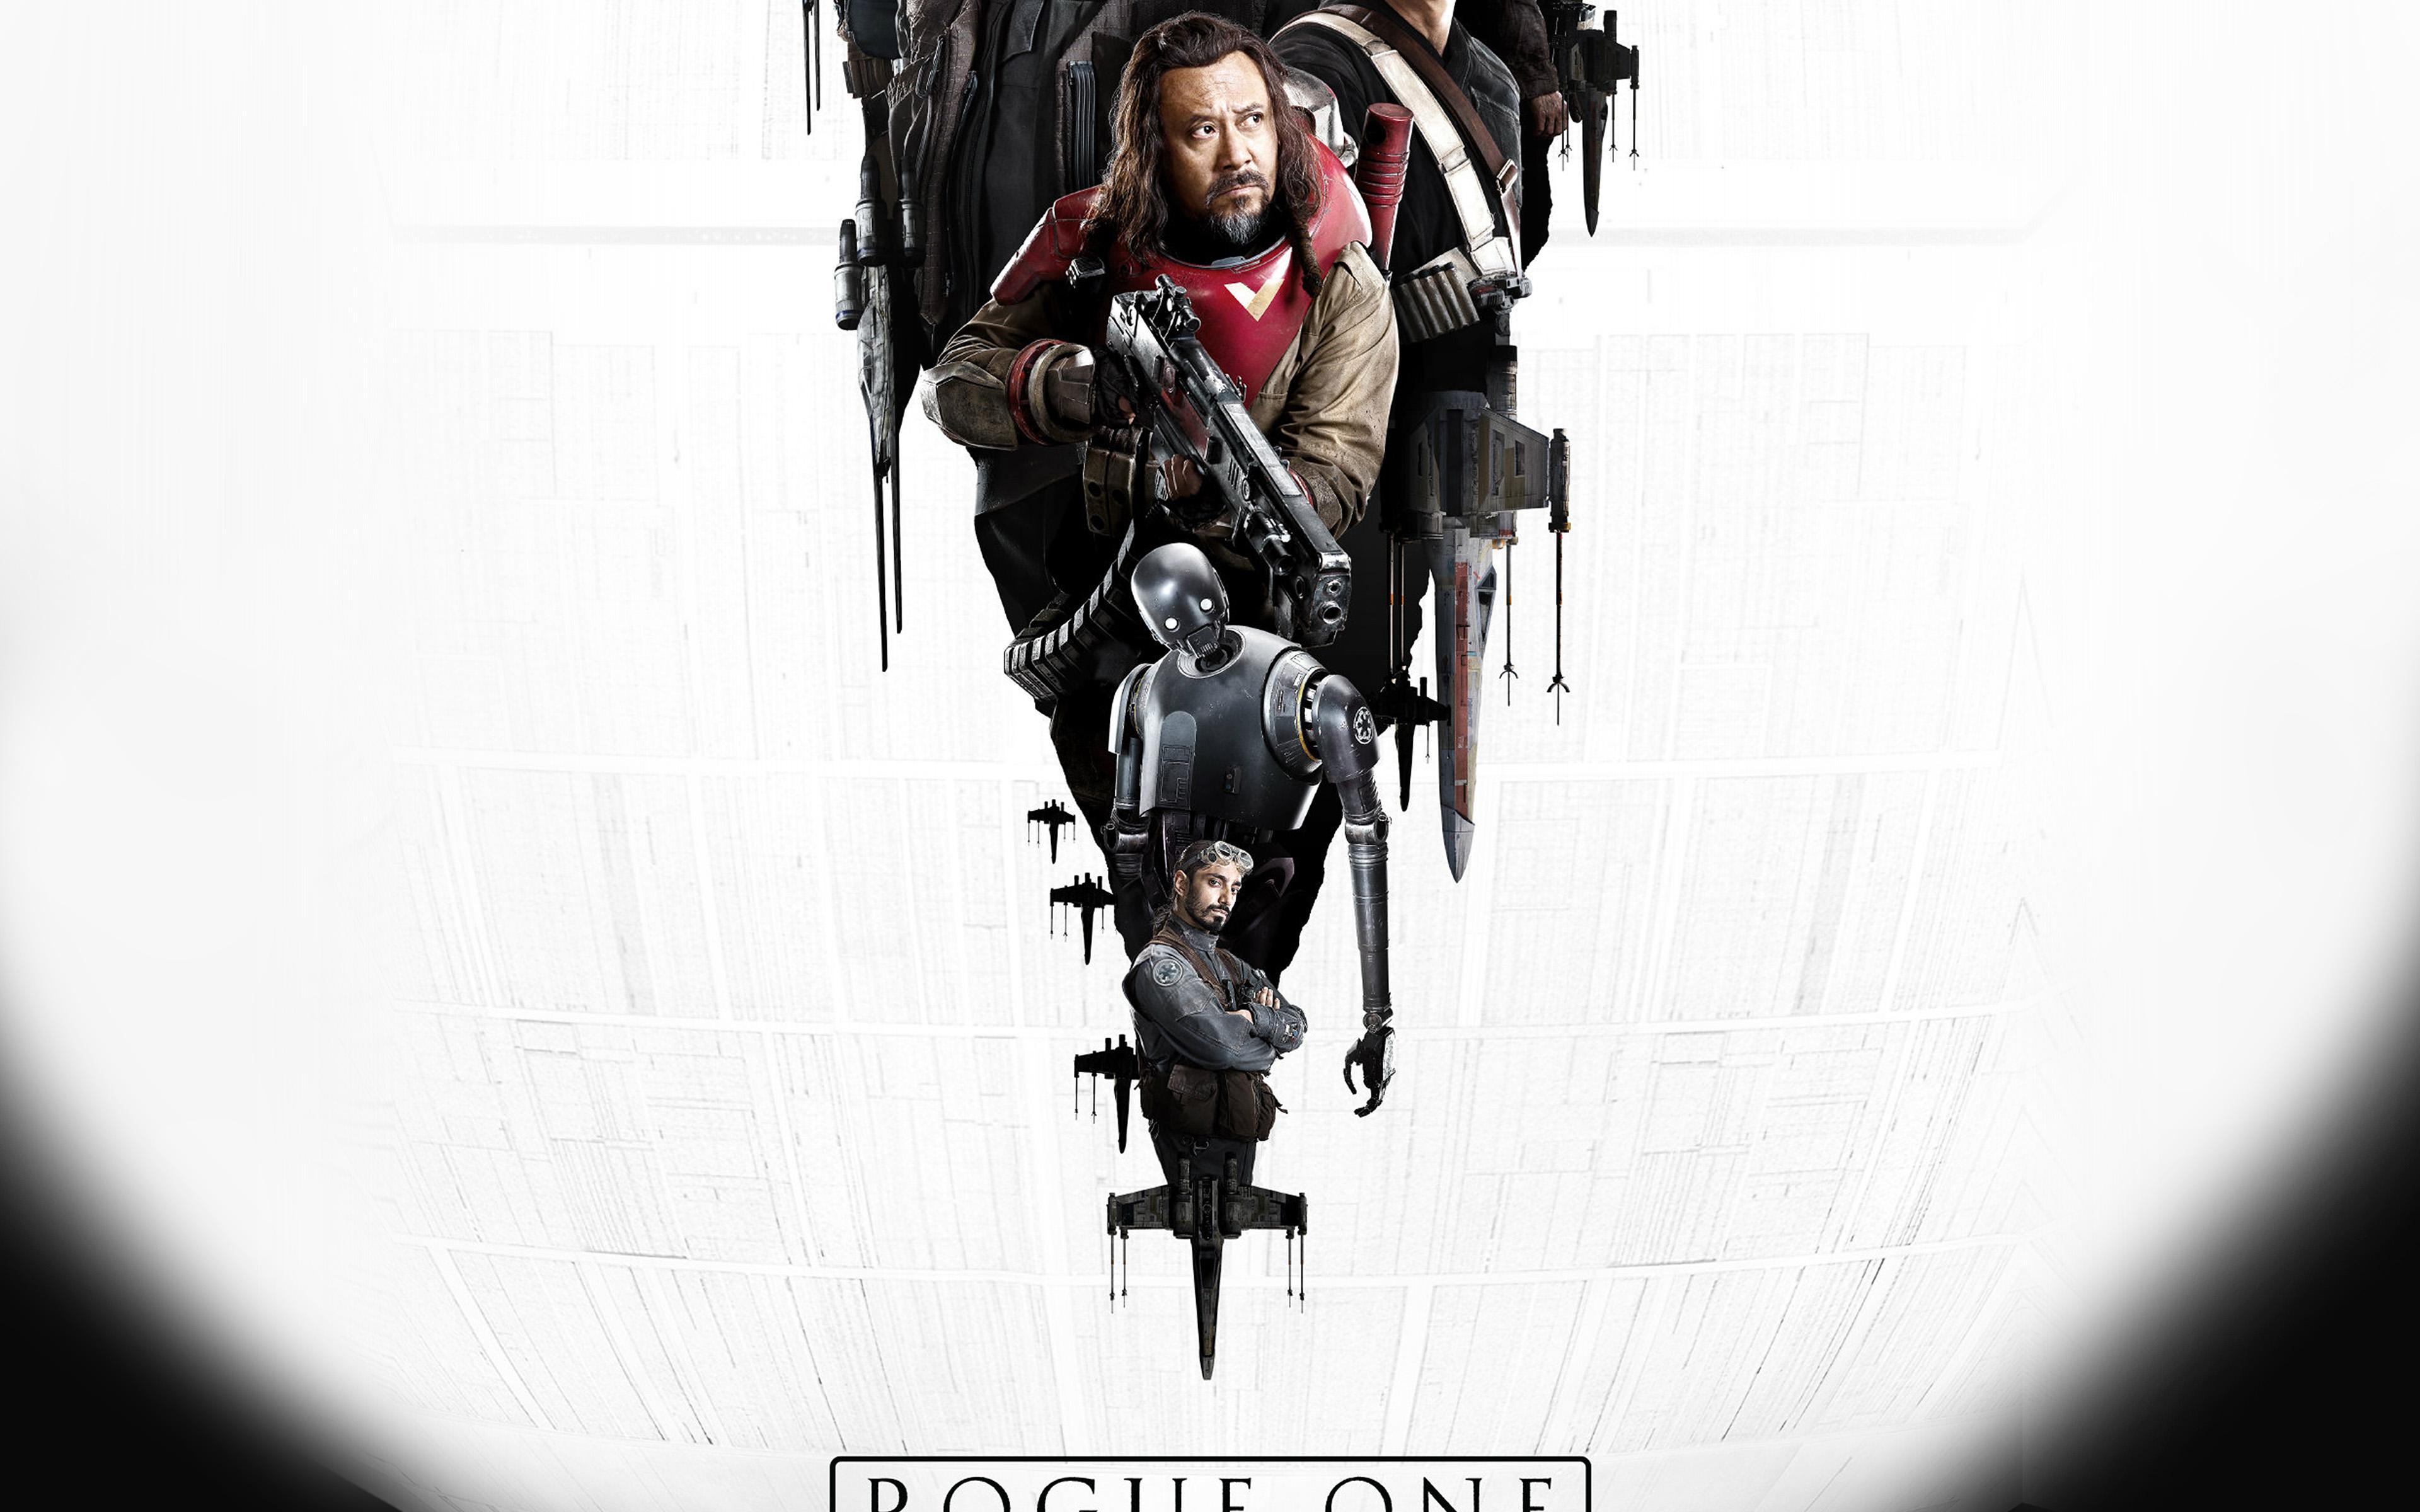 Aw01 Film Rogue One Starwars Poster Illustration Art Wallpaper